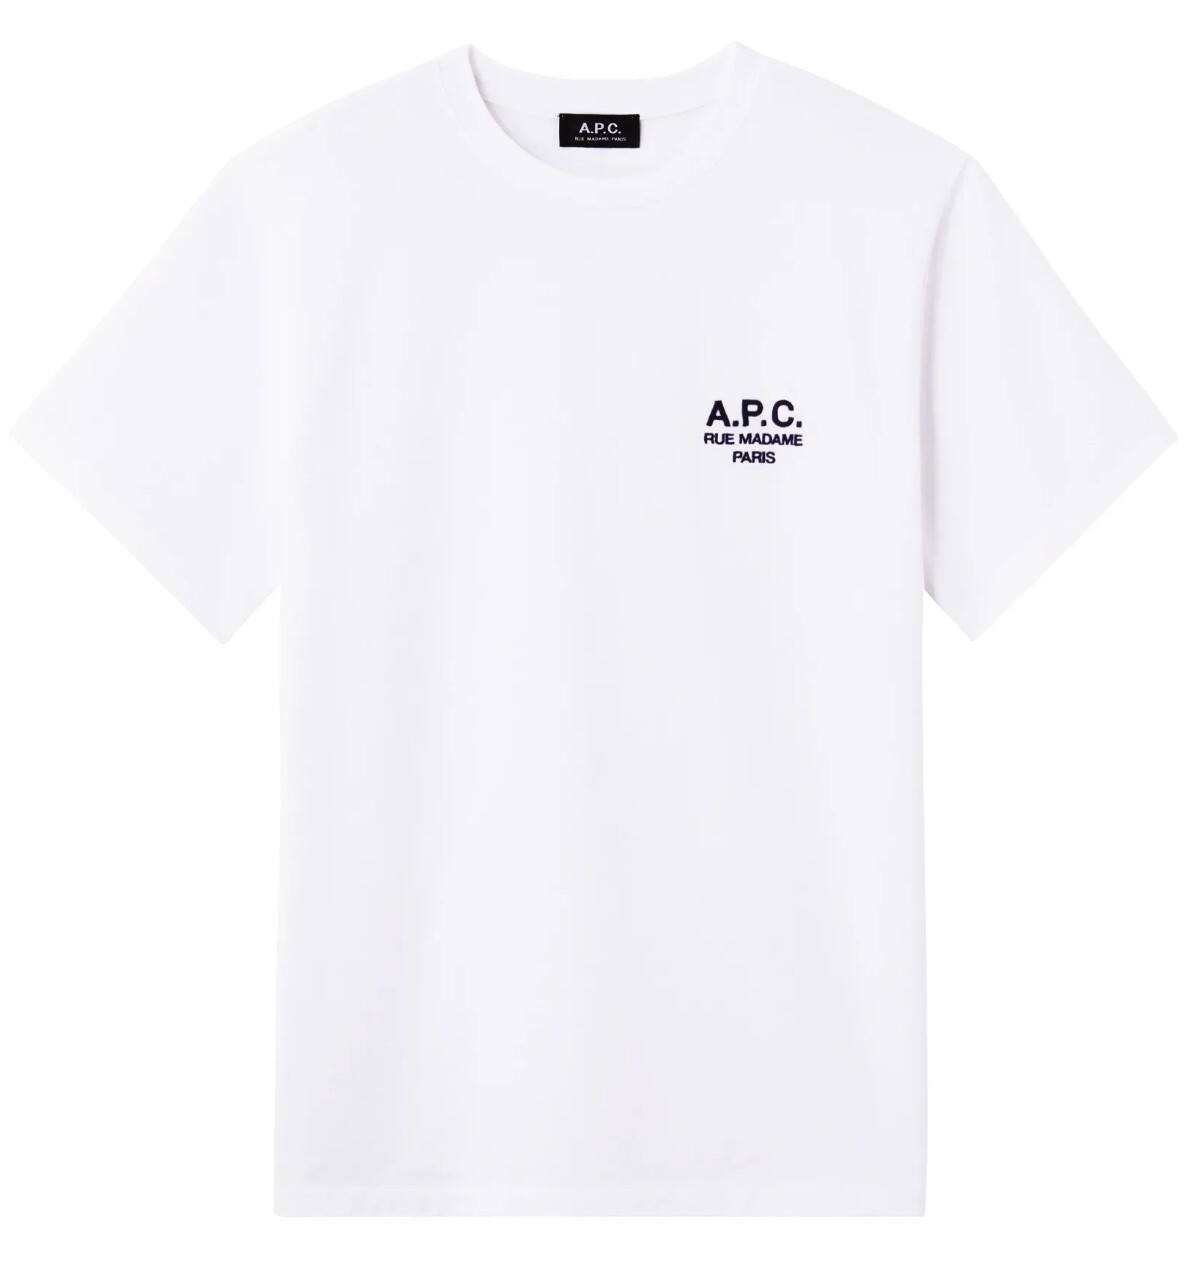 T-SHIRT A.P.C RAYMOND WHITE